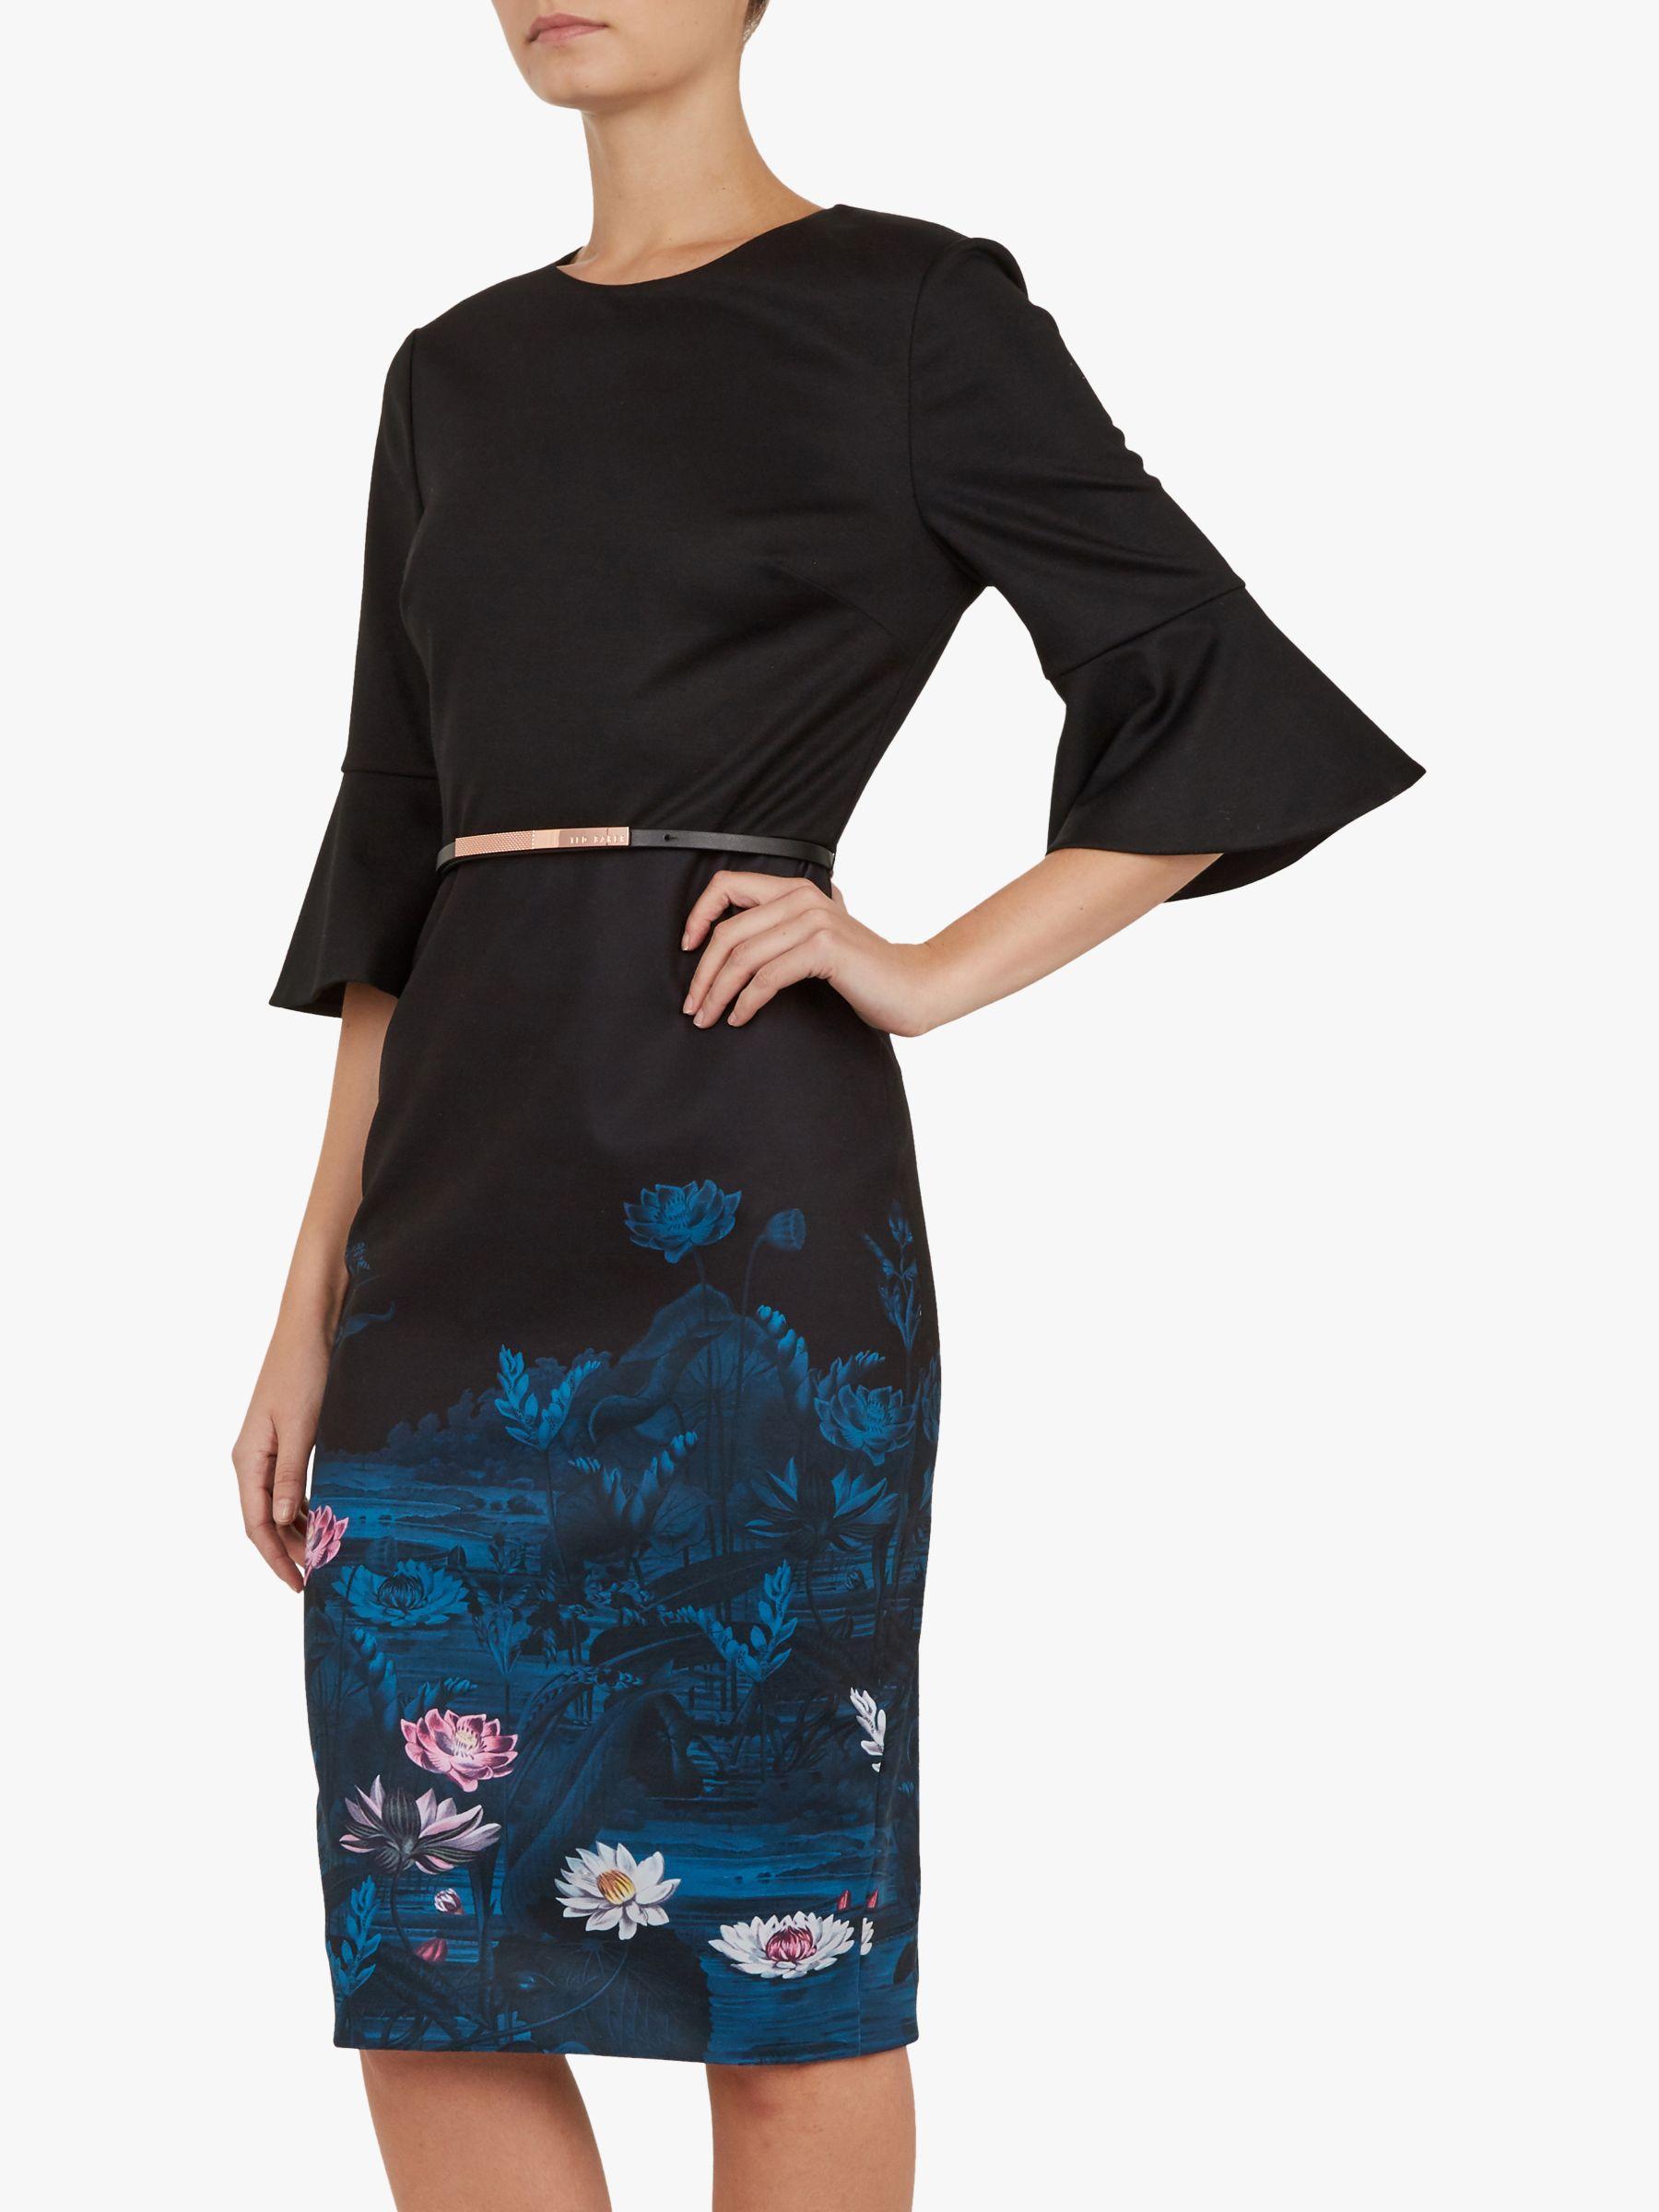 5cd777e40fa37 Ted Baker Azania Floral Pencil Dress in Blue - Lyst